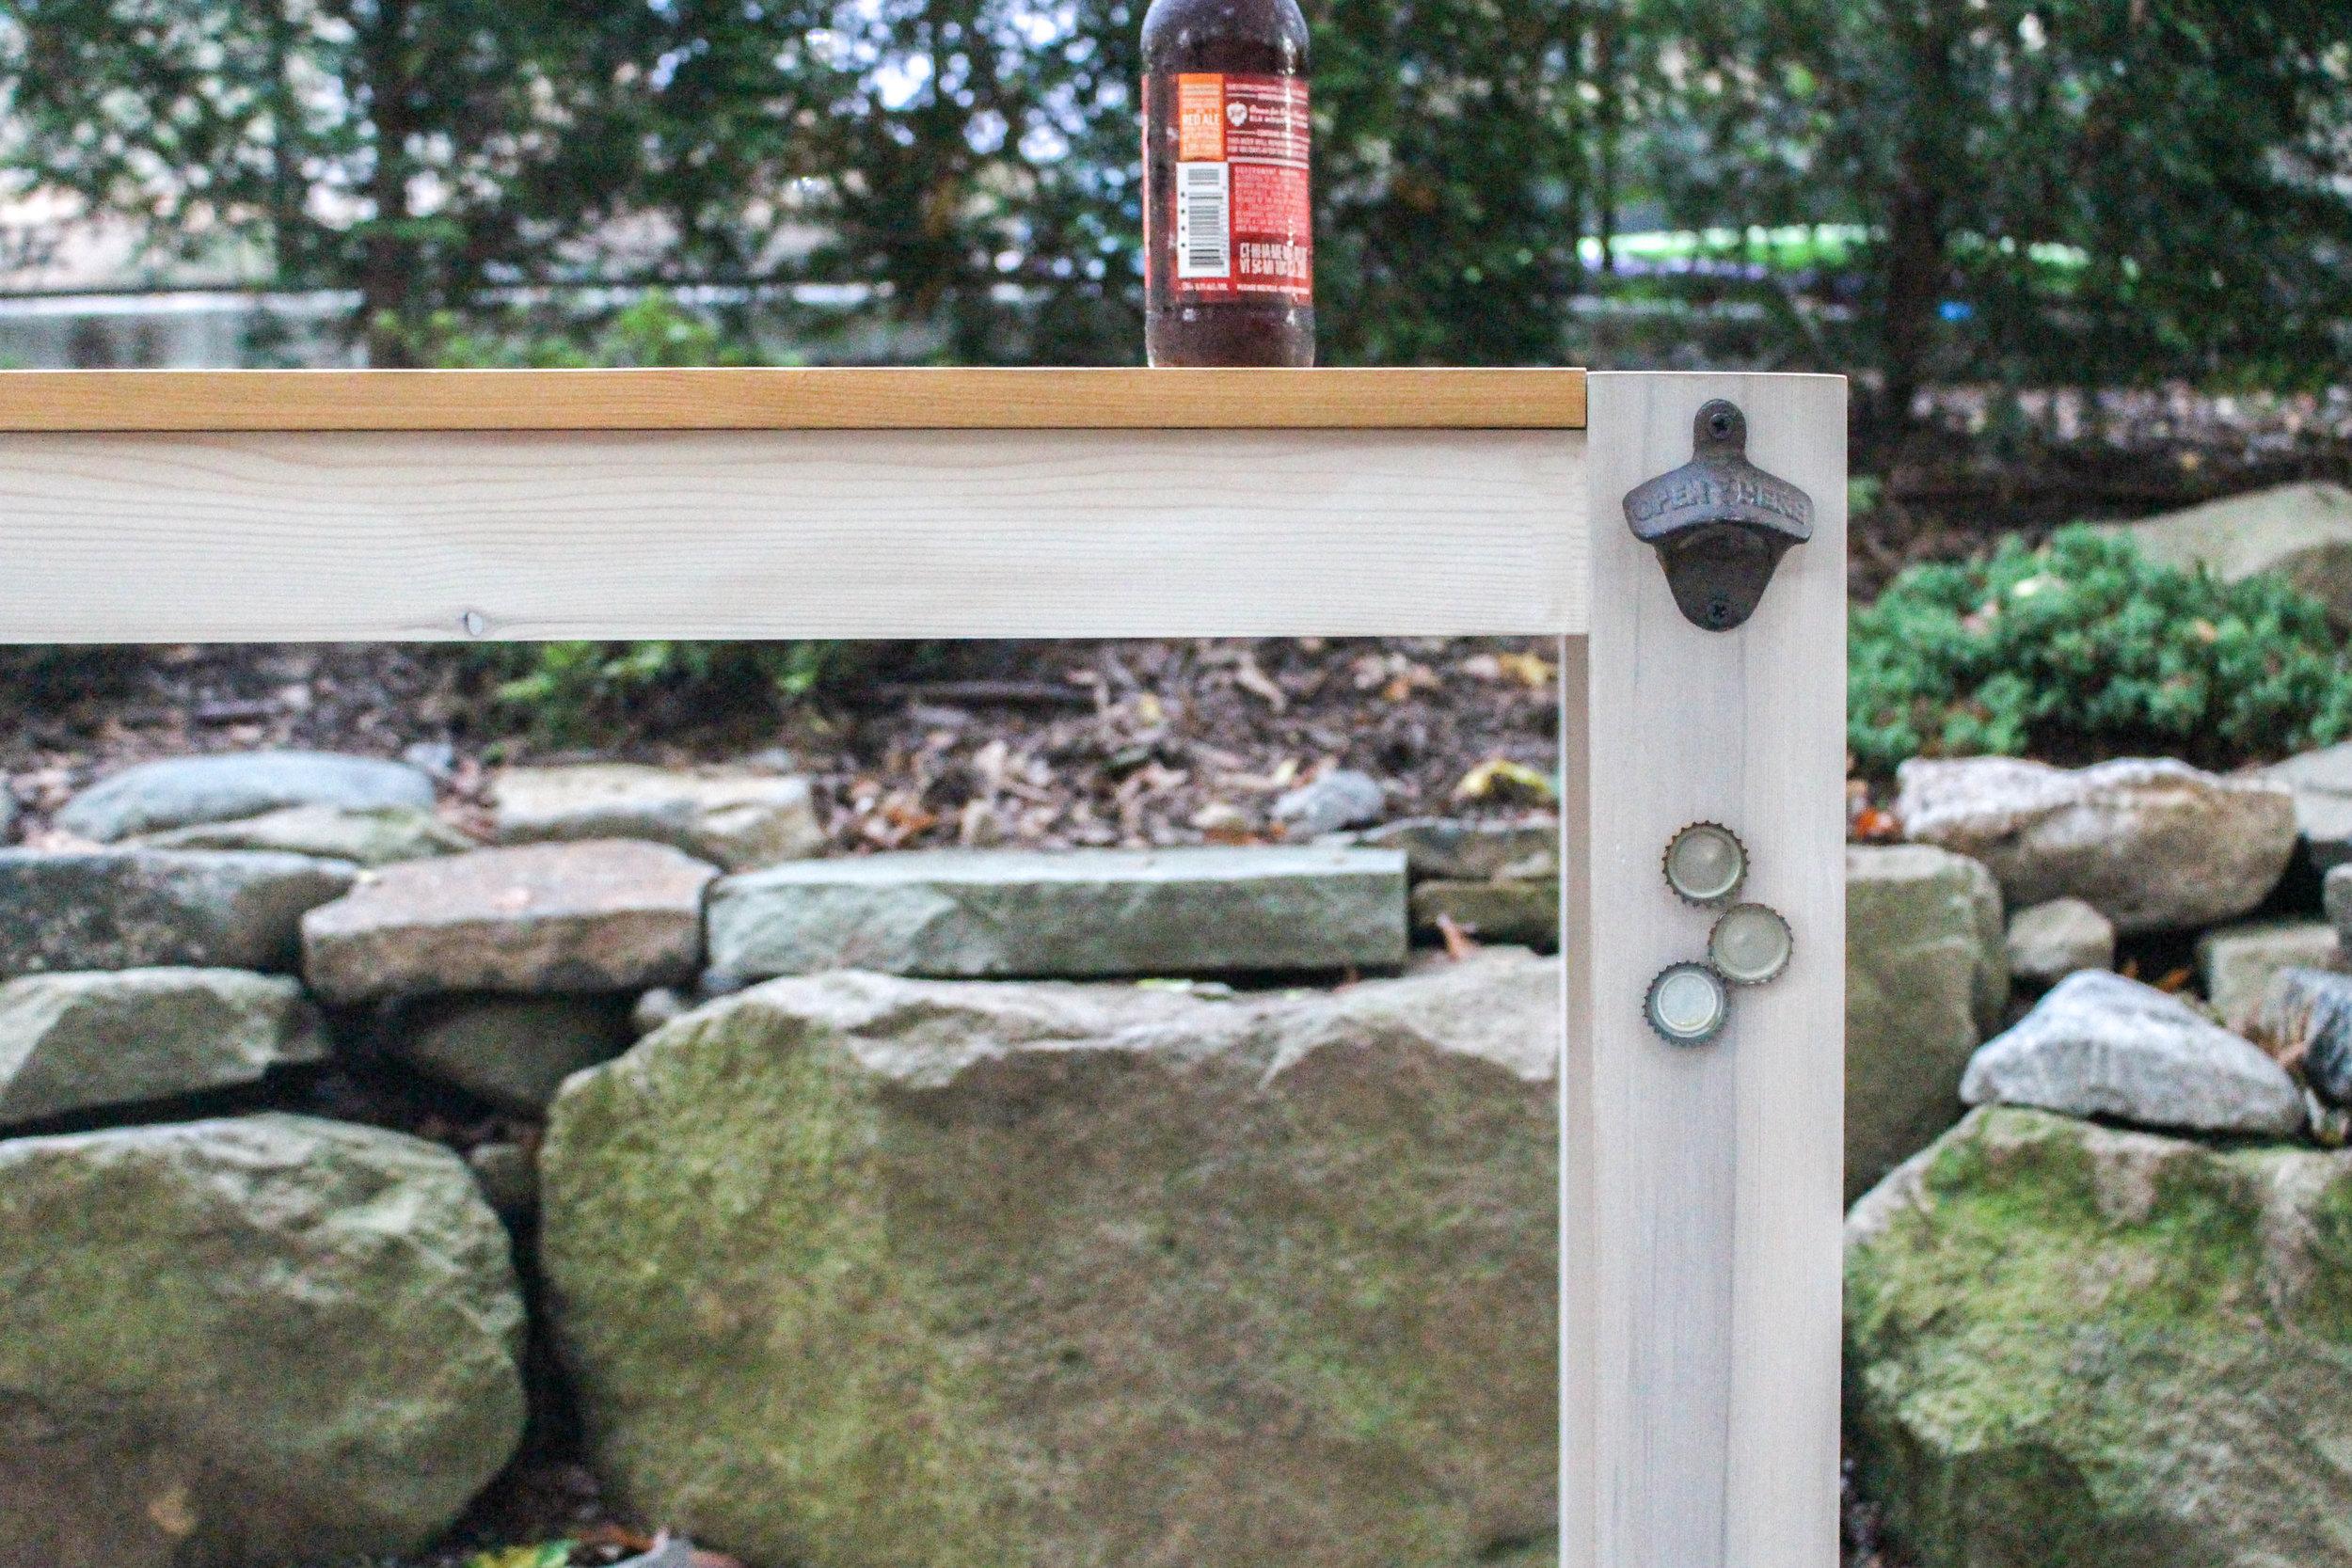 Outdoor Table with Built-In Bottle Cap Catcher